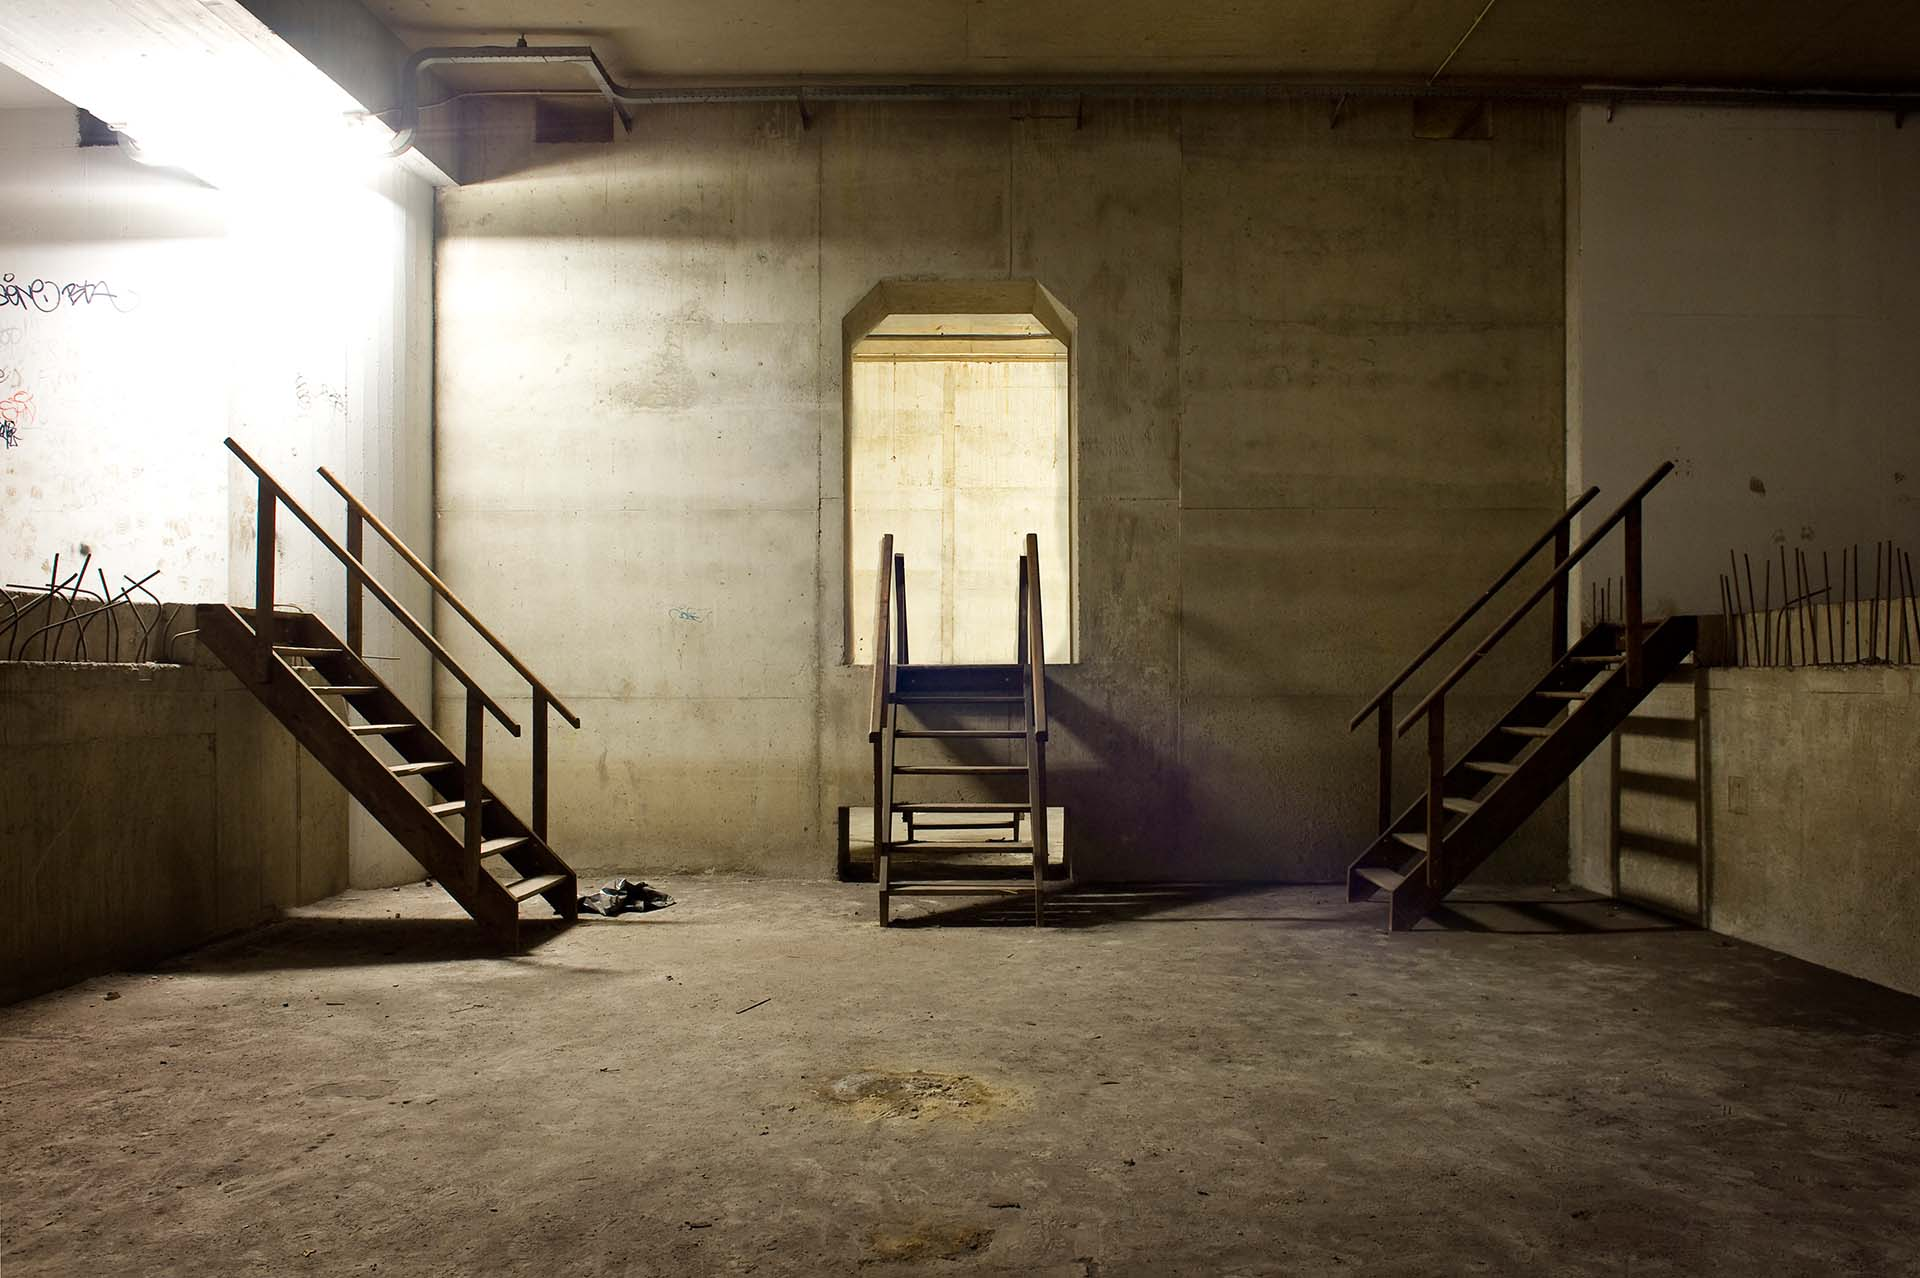 architectuur fotografie Frank Penders